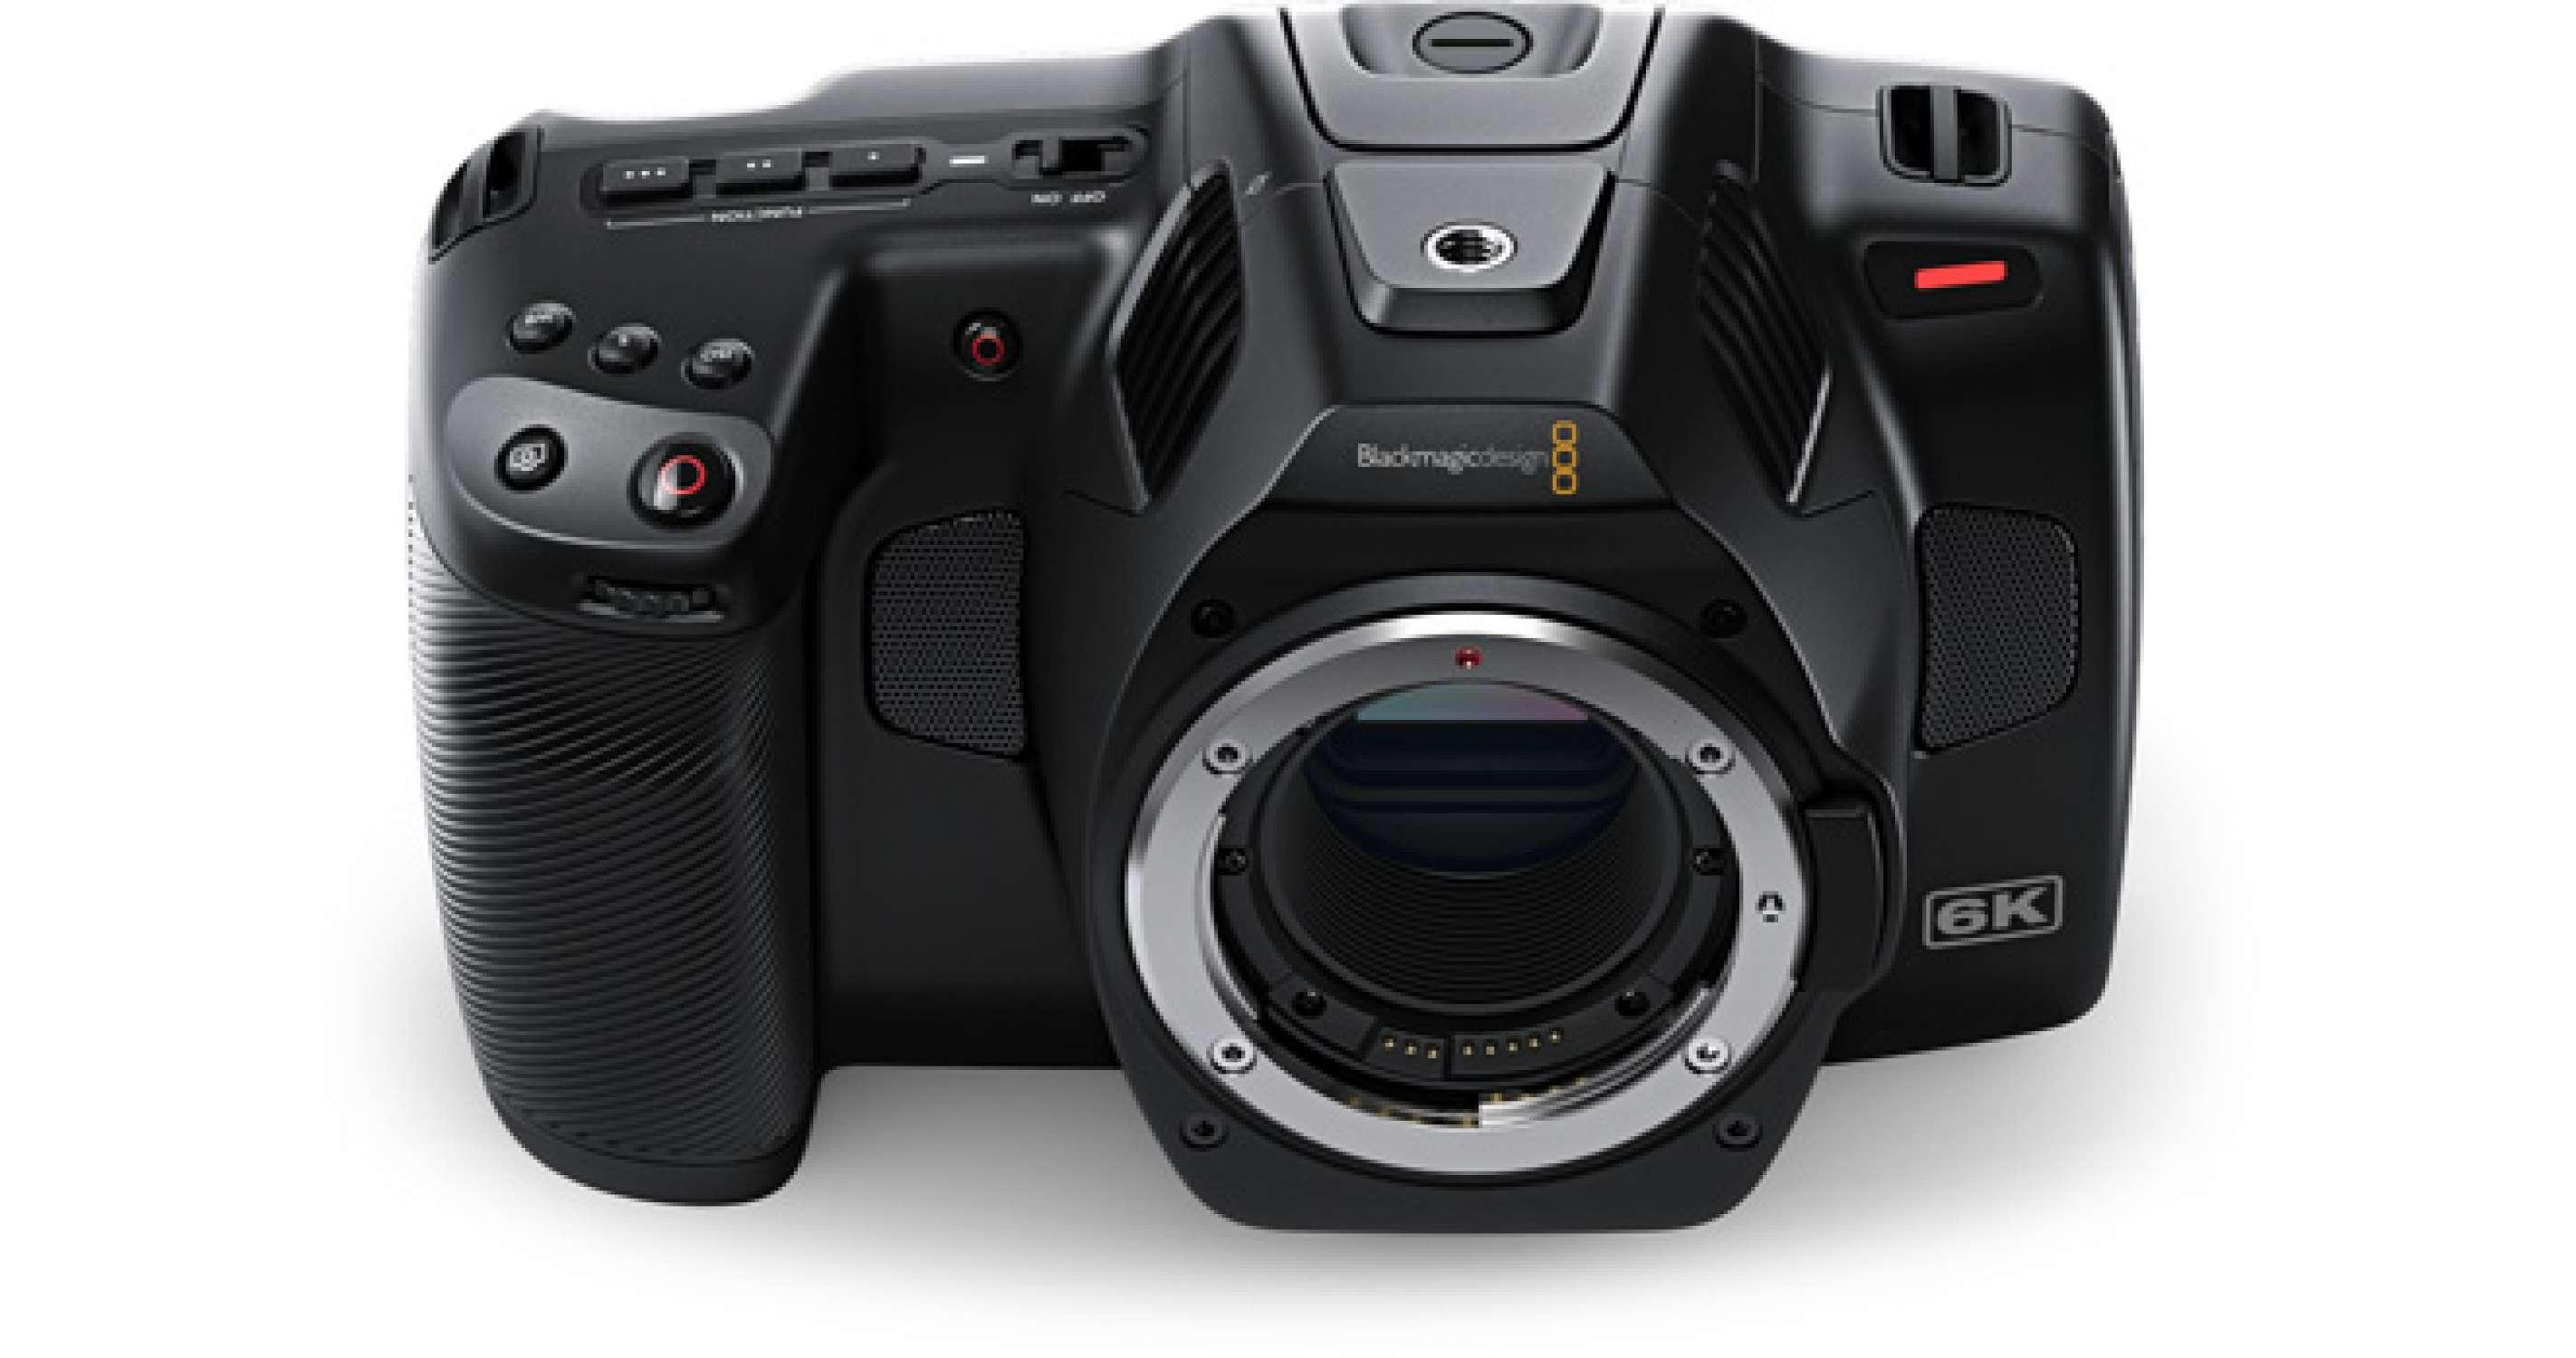 BlackMagic Pocket Cinéma 6k Pro EF